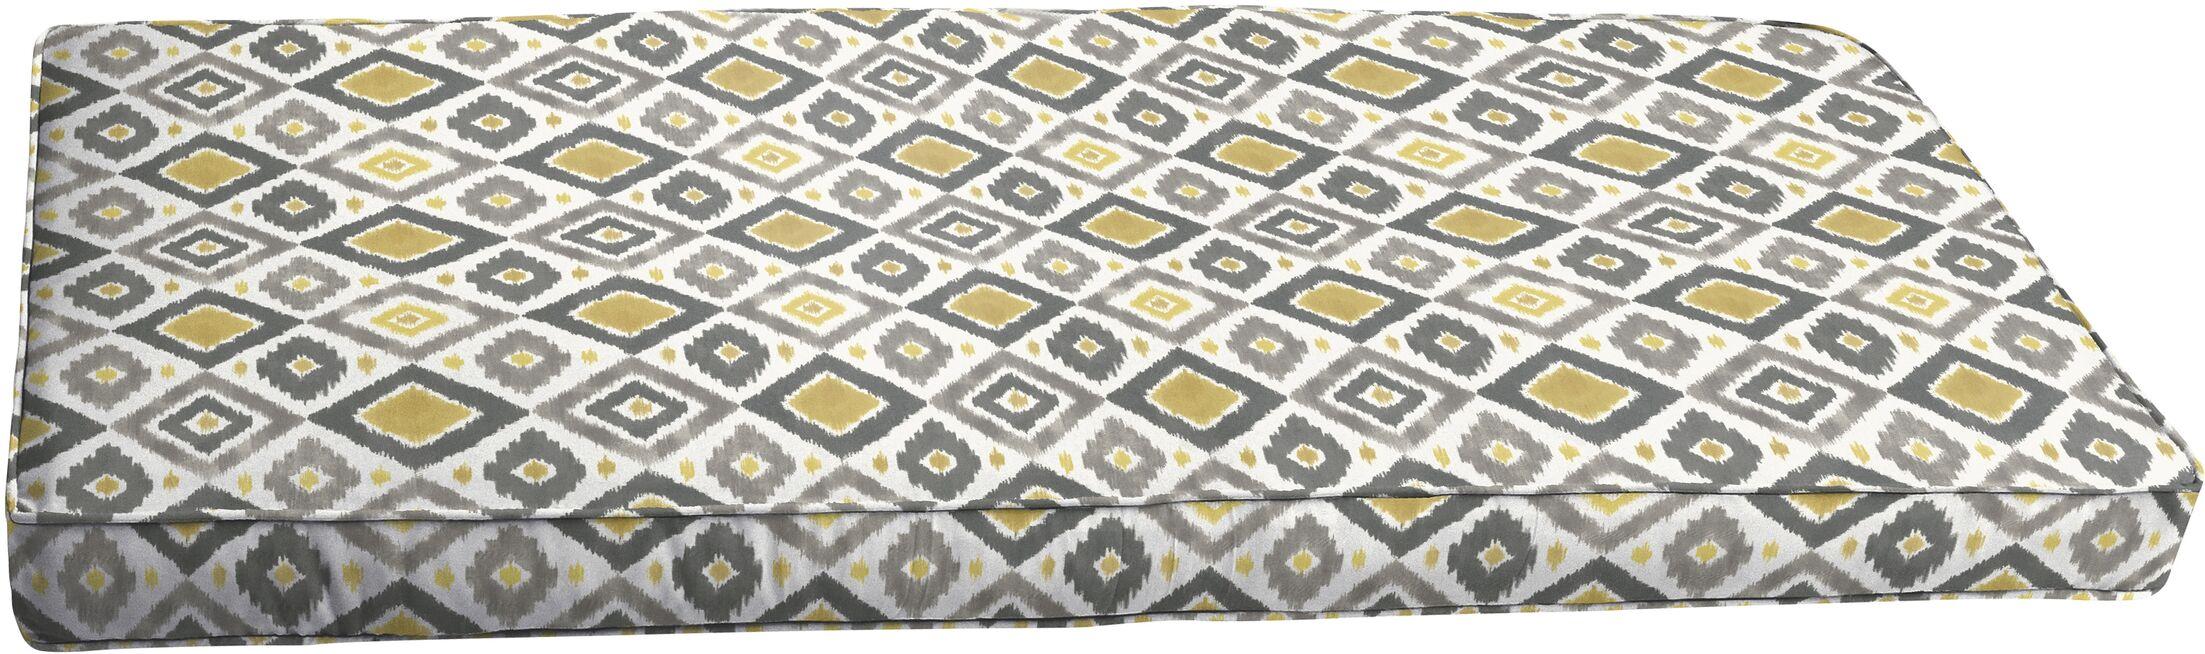 Socoma Indoor/Outdoor Bench Cushion Size: 60